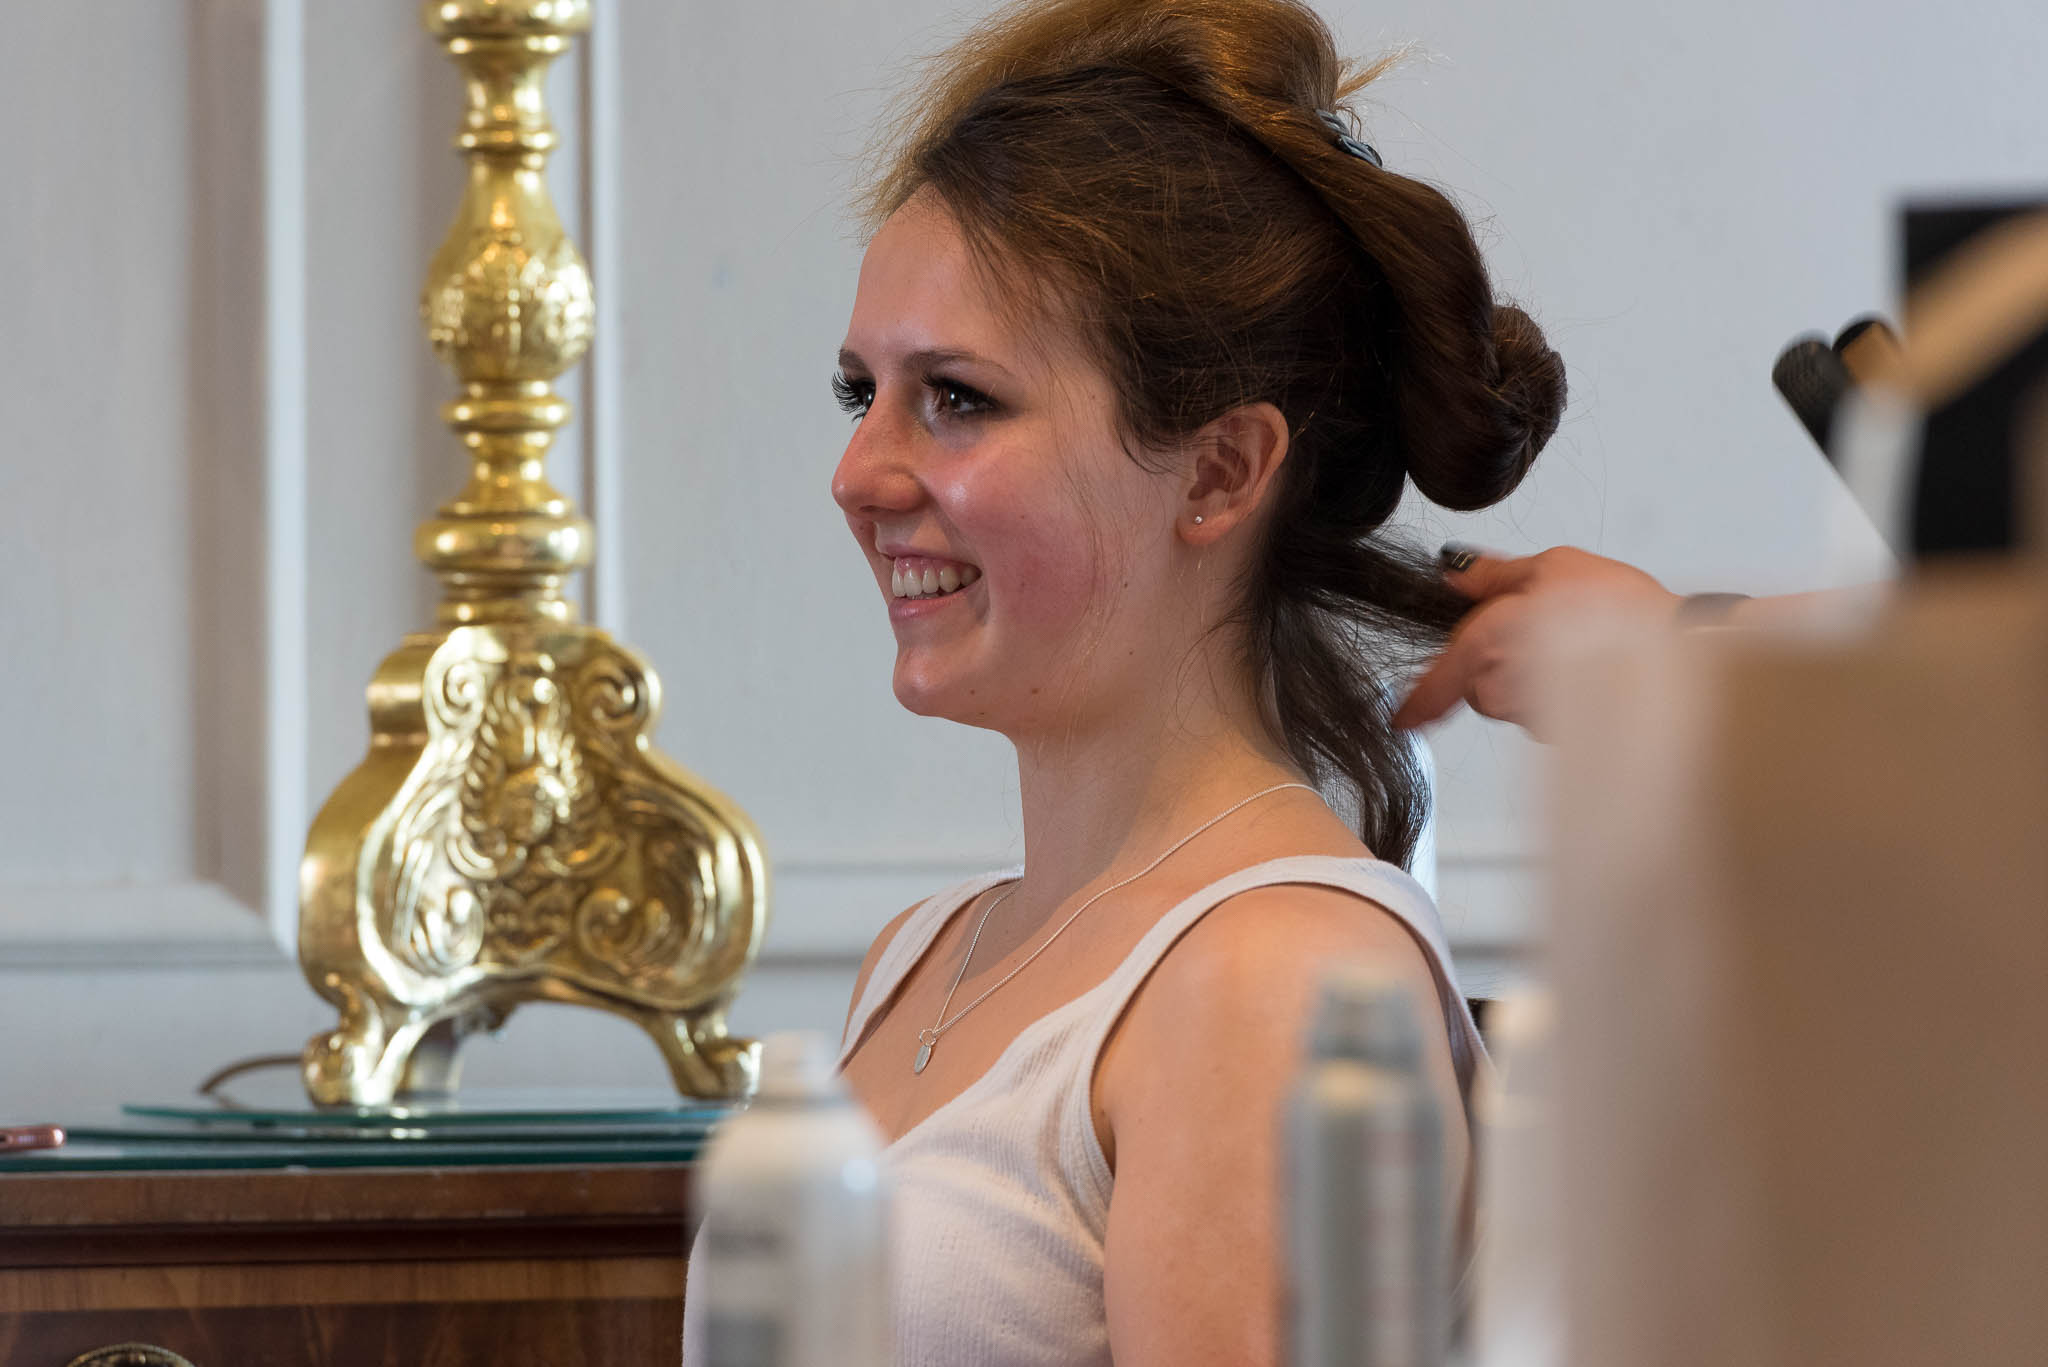 Crathorne Hall Hotel Wedding Photographer6.jpg